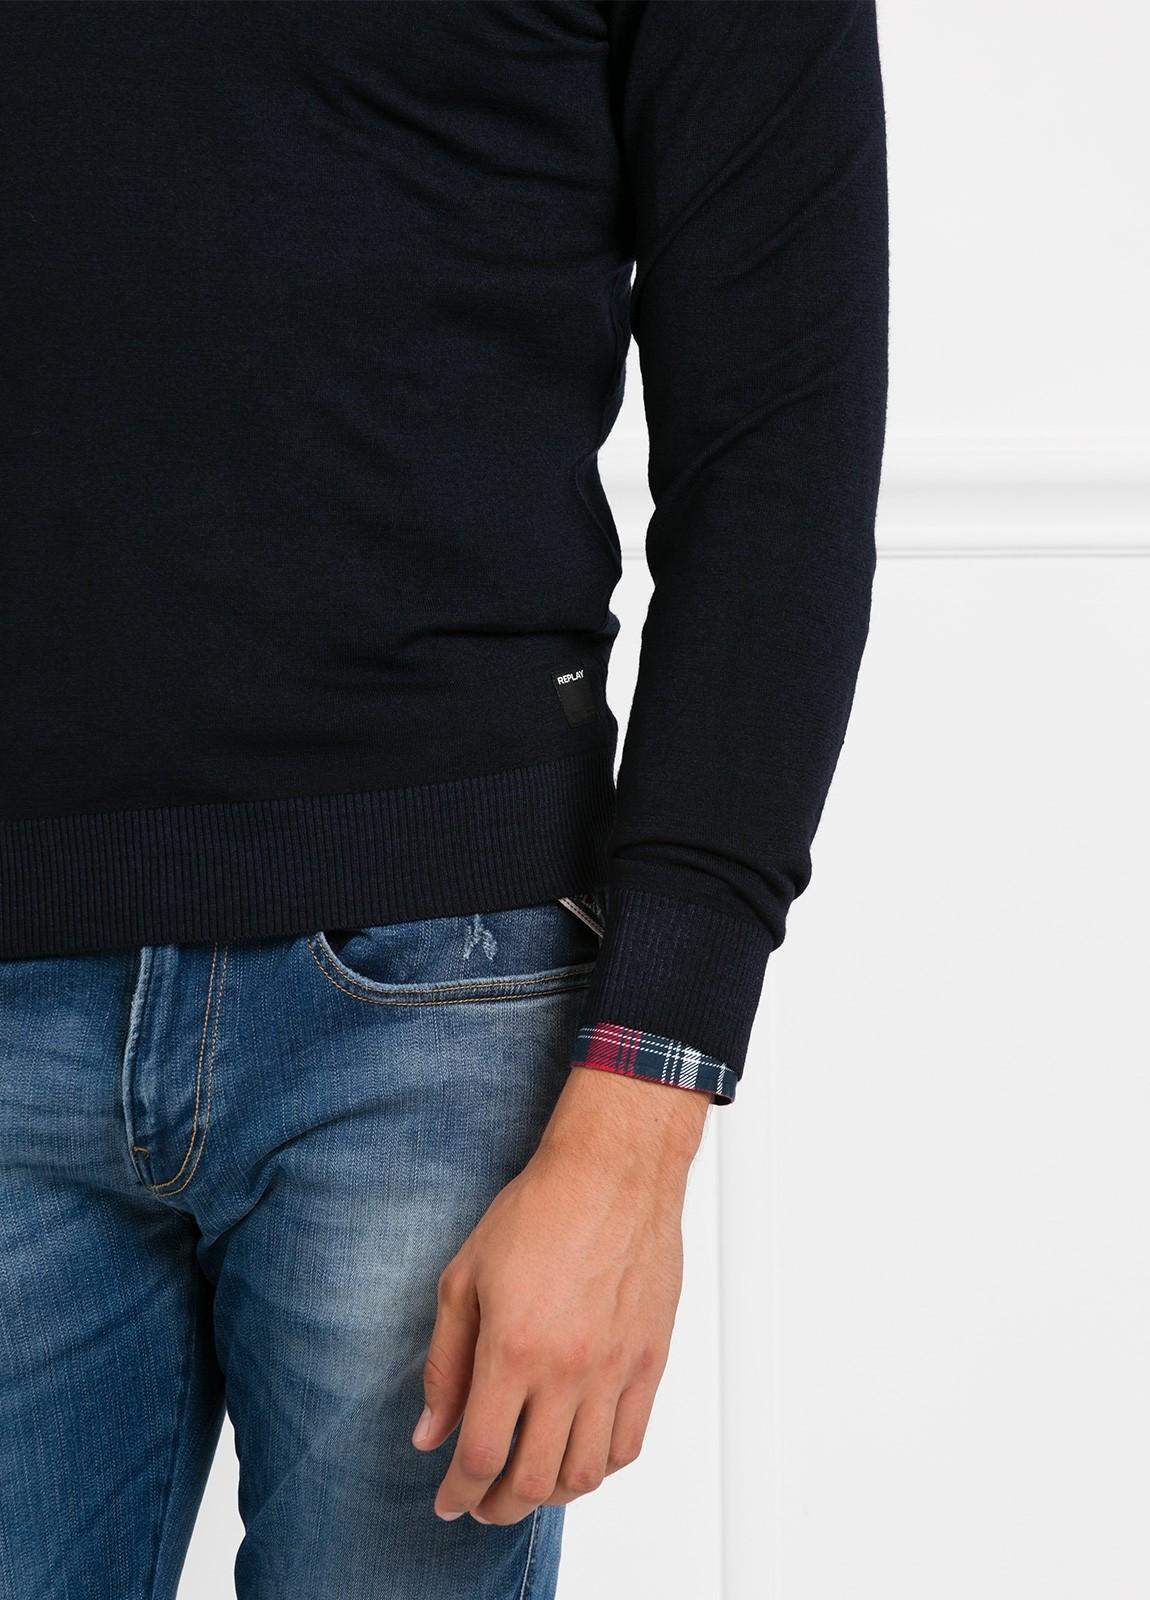 Suéter manga larga, cuello pico, color azul marino. 100% Lana. - Ítem1